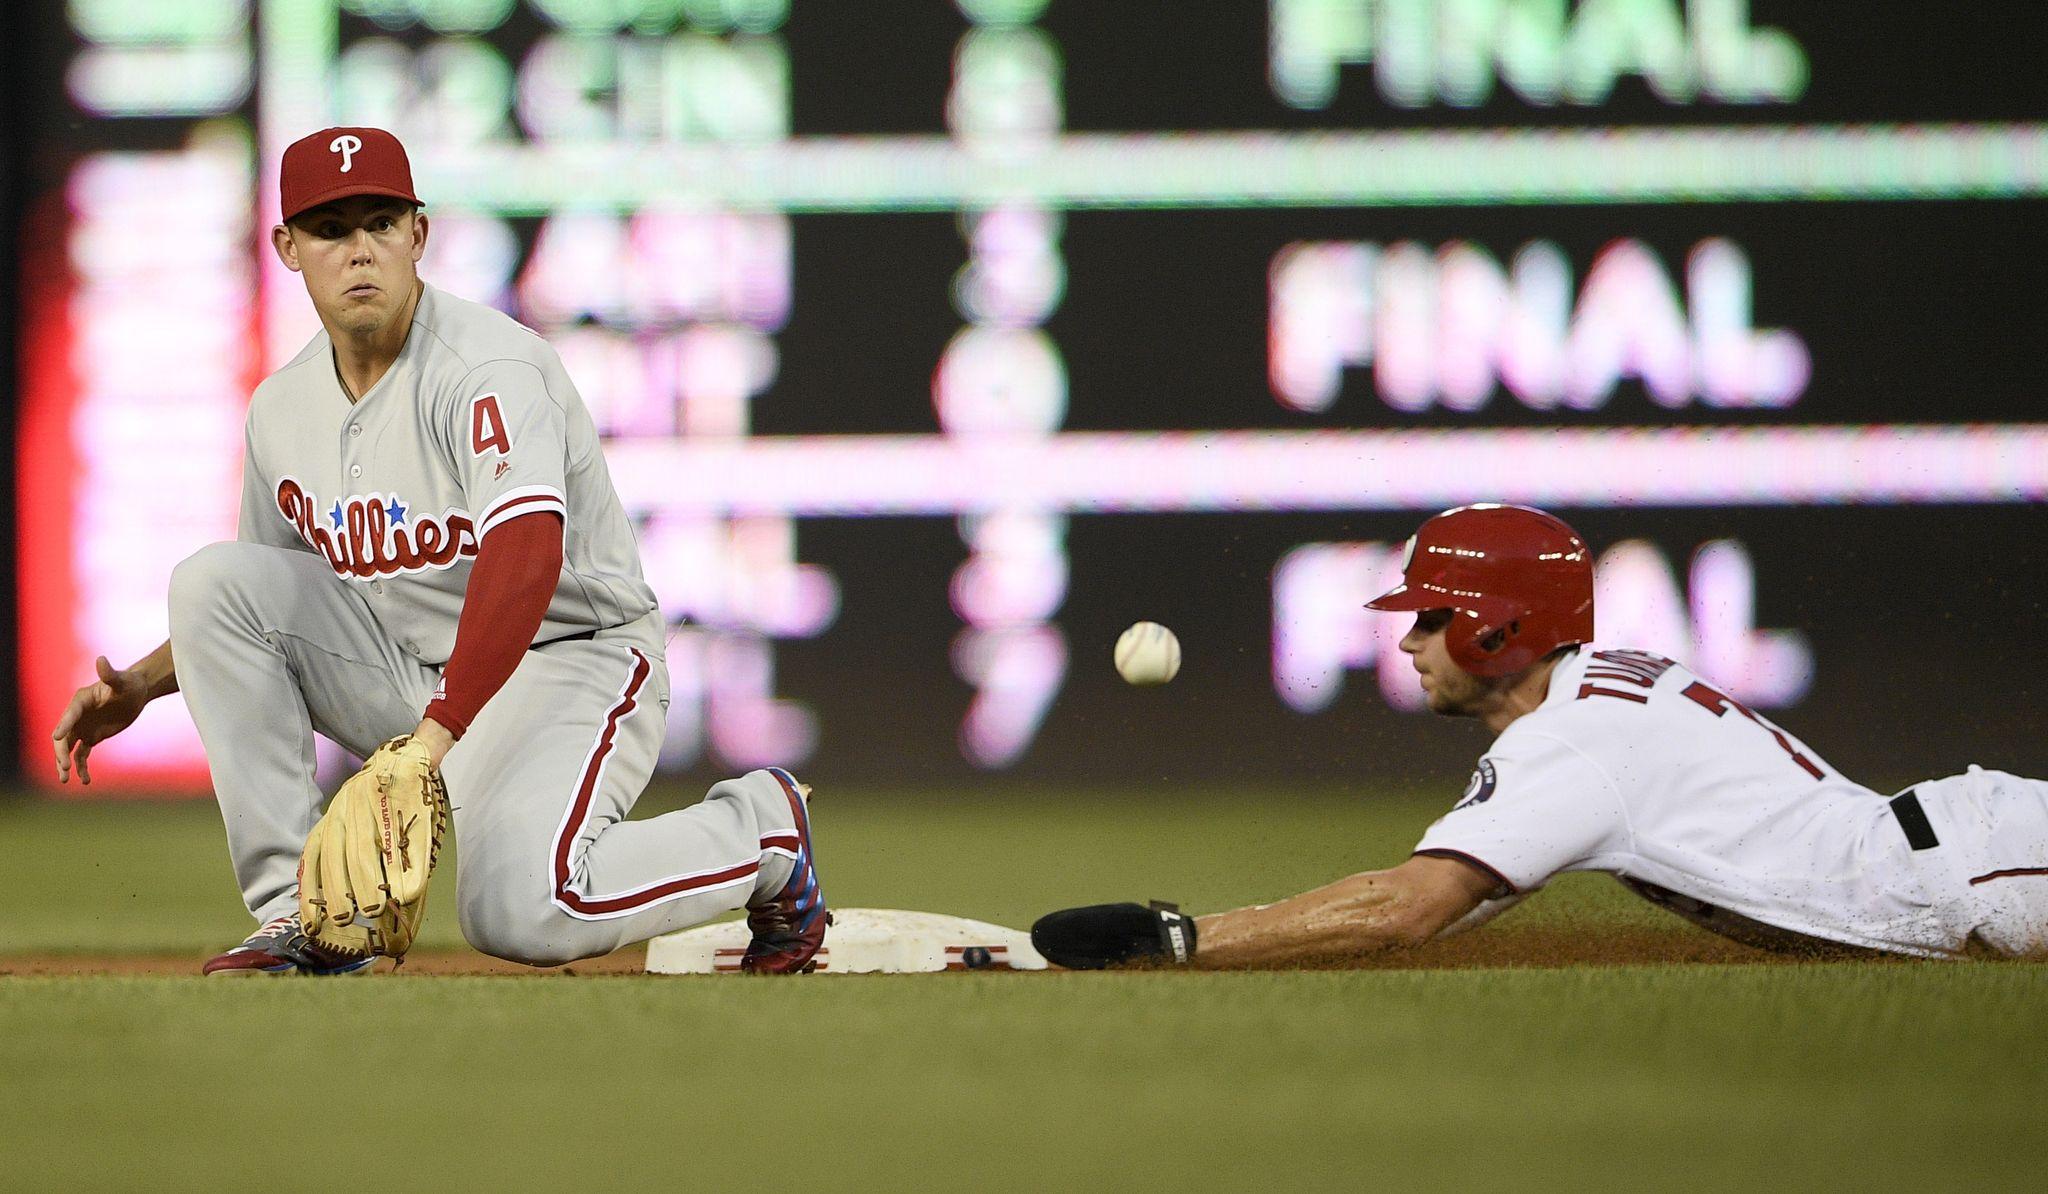 Phillies_nationals_baseball_70342.jpg-baa5f_s2048x1194